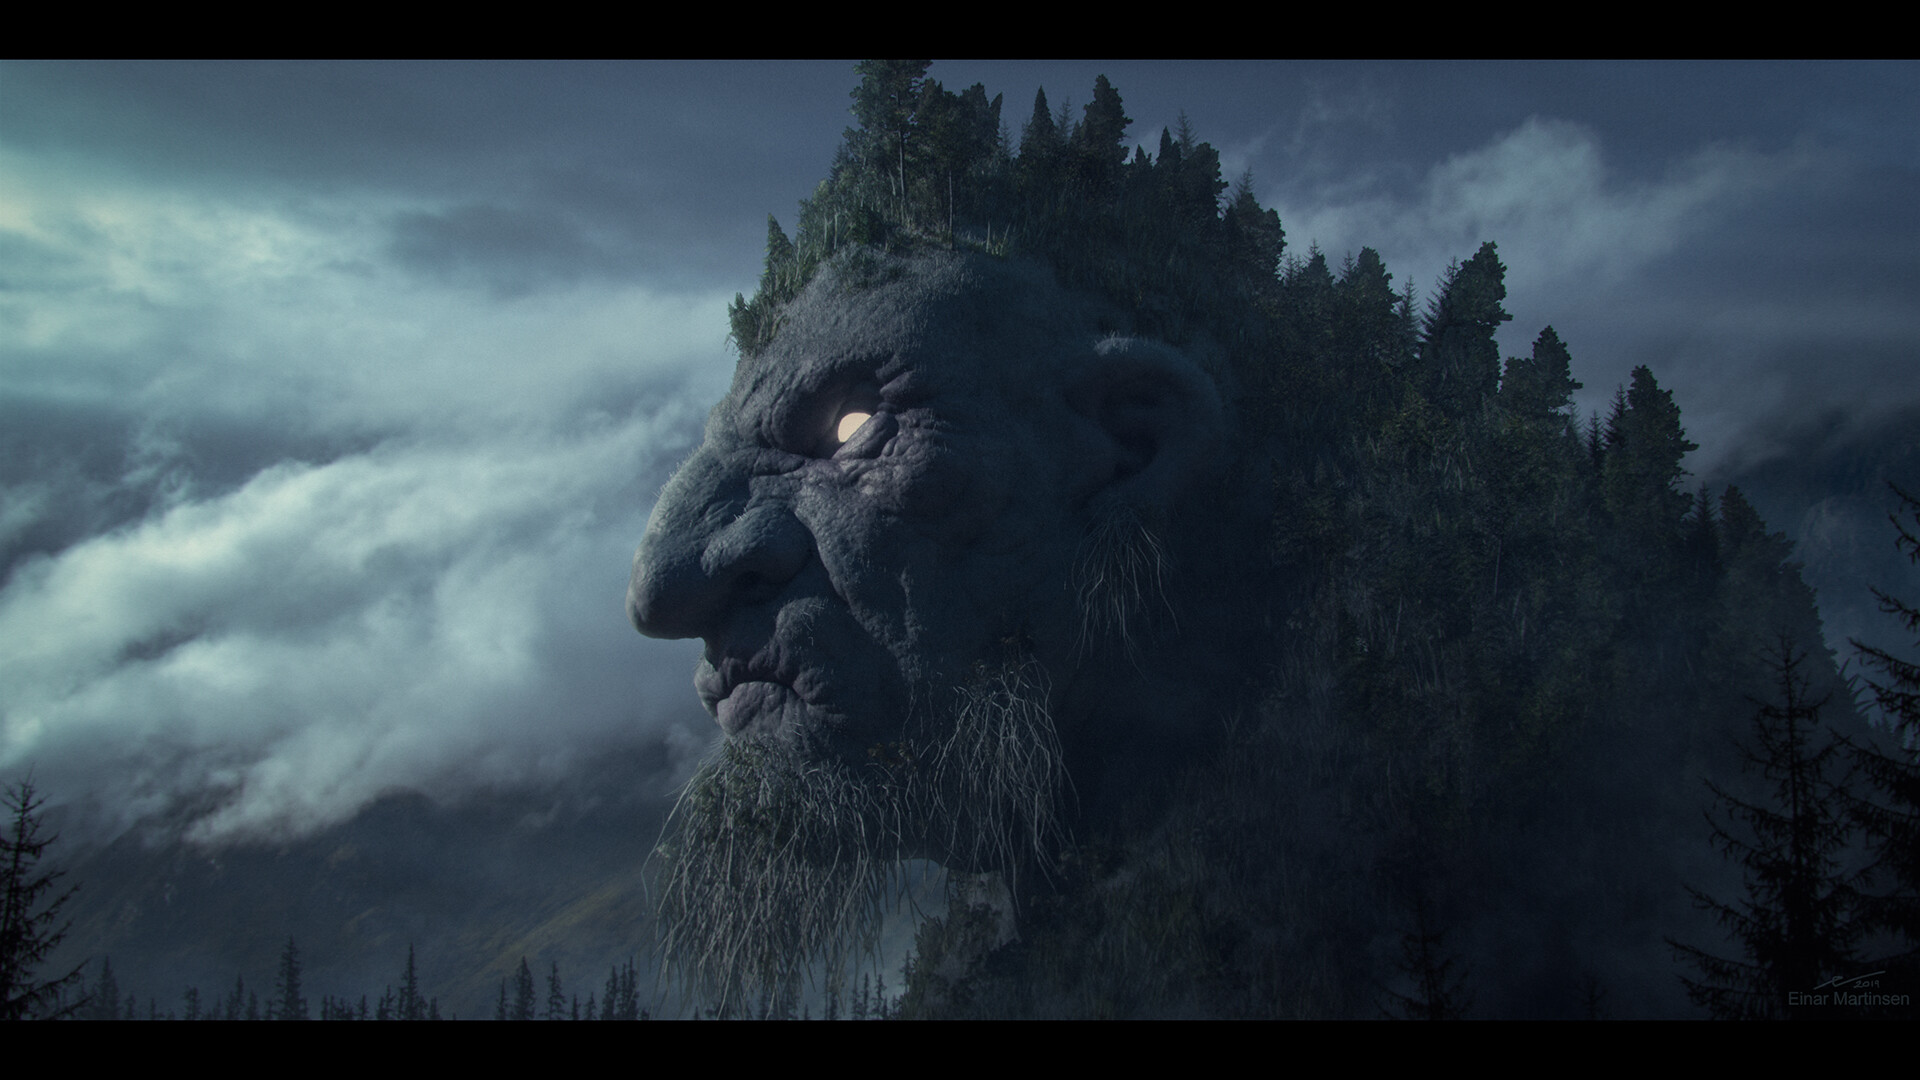 Einar martinsen viking troll em 01